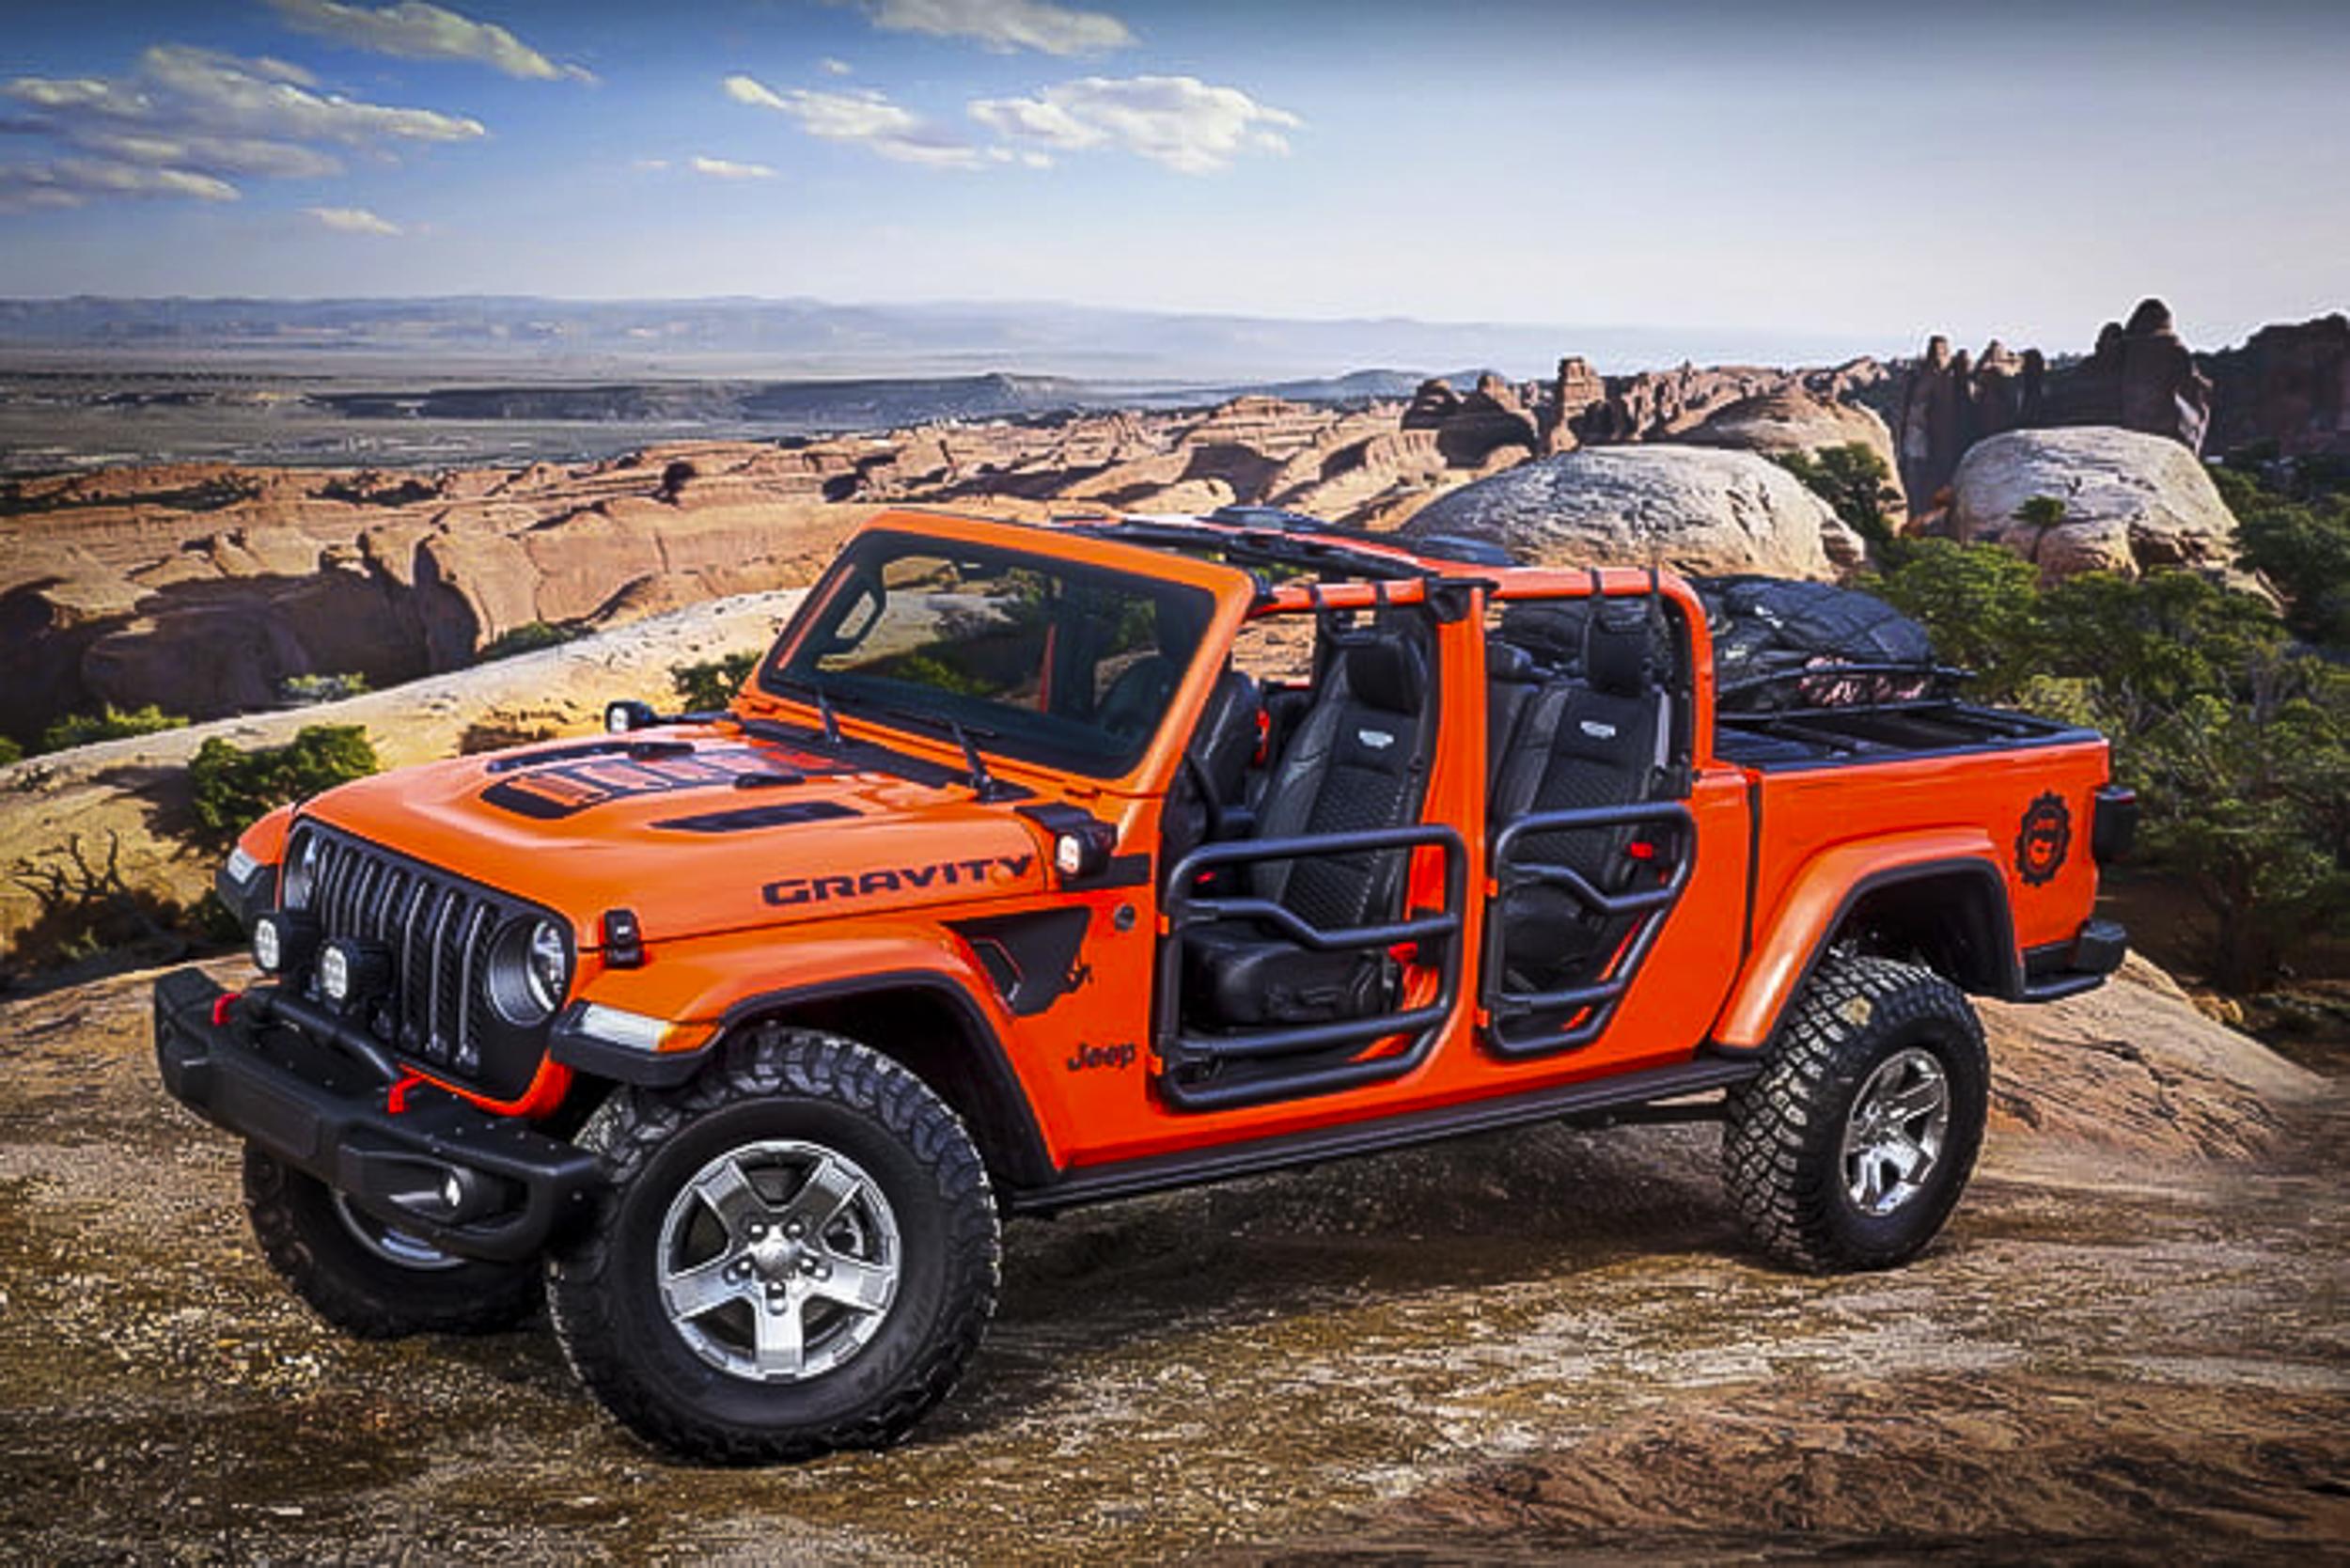 2019-jeep-moab-safari-concepts-12-700x467-c.jpg